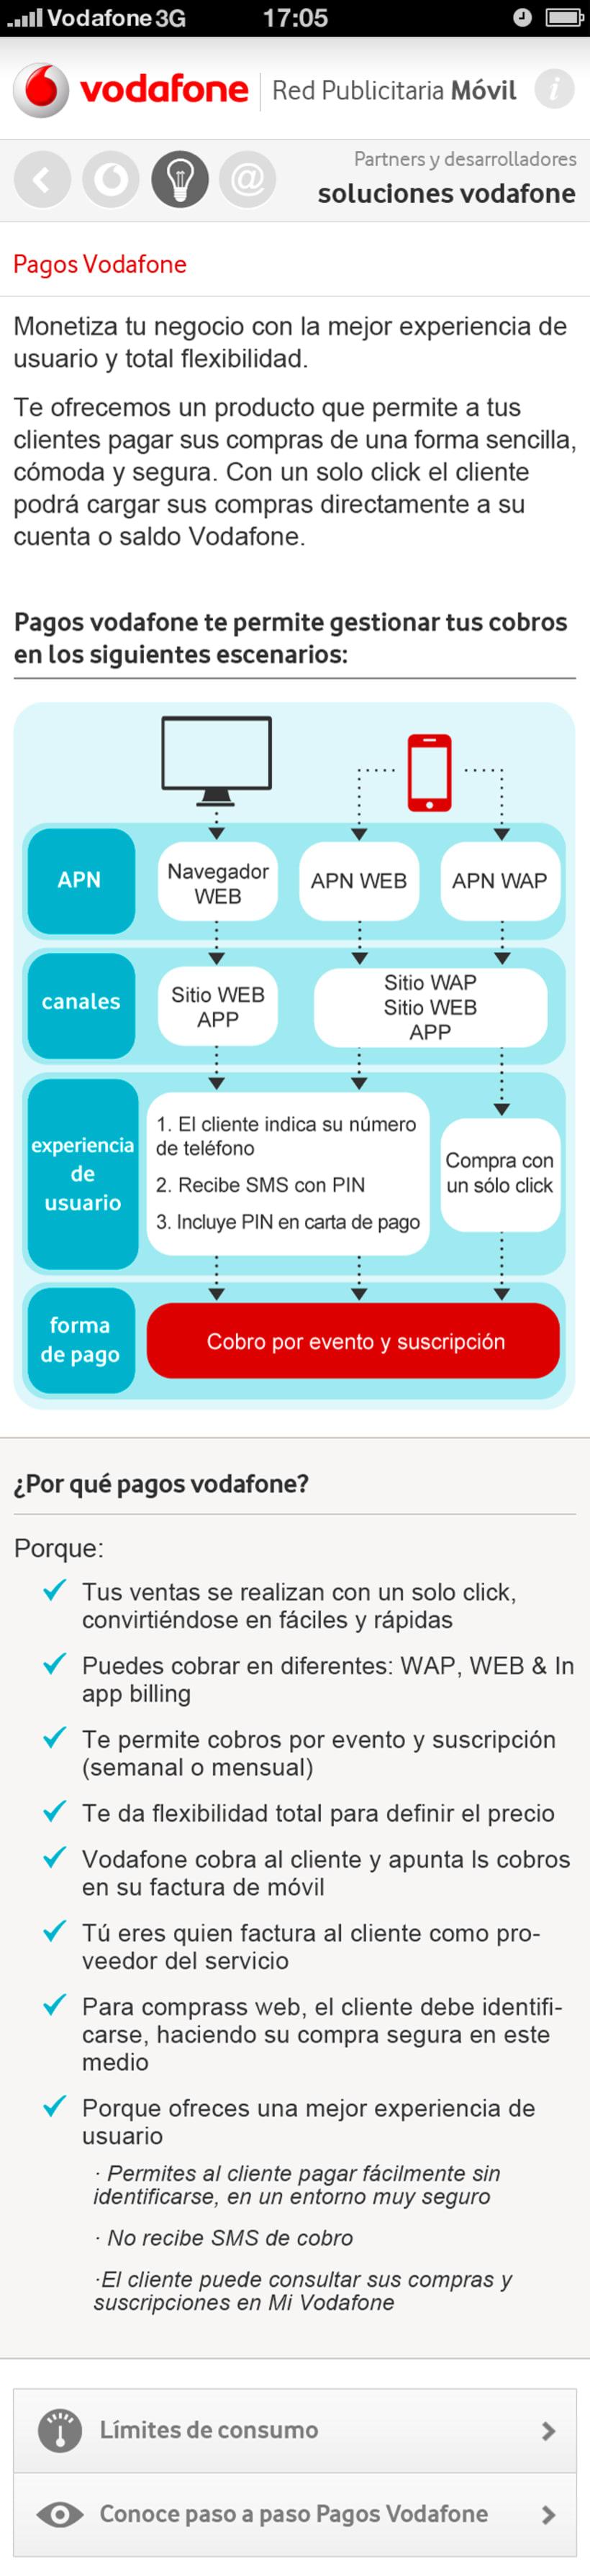 Vodafone - Superintend on brand's side  3